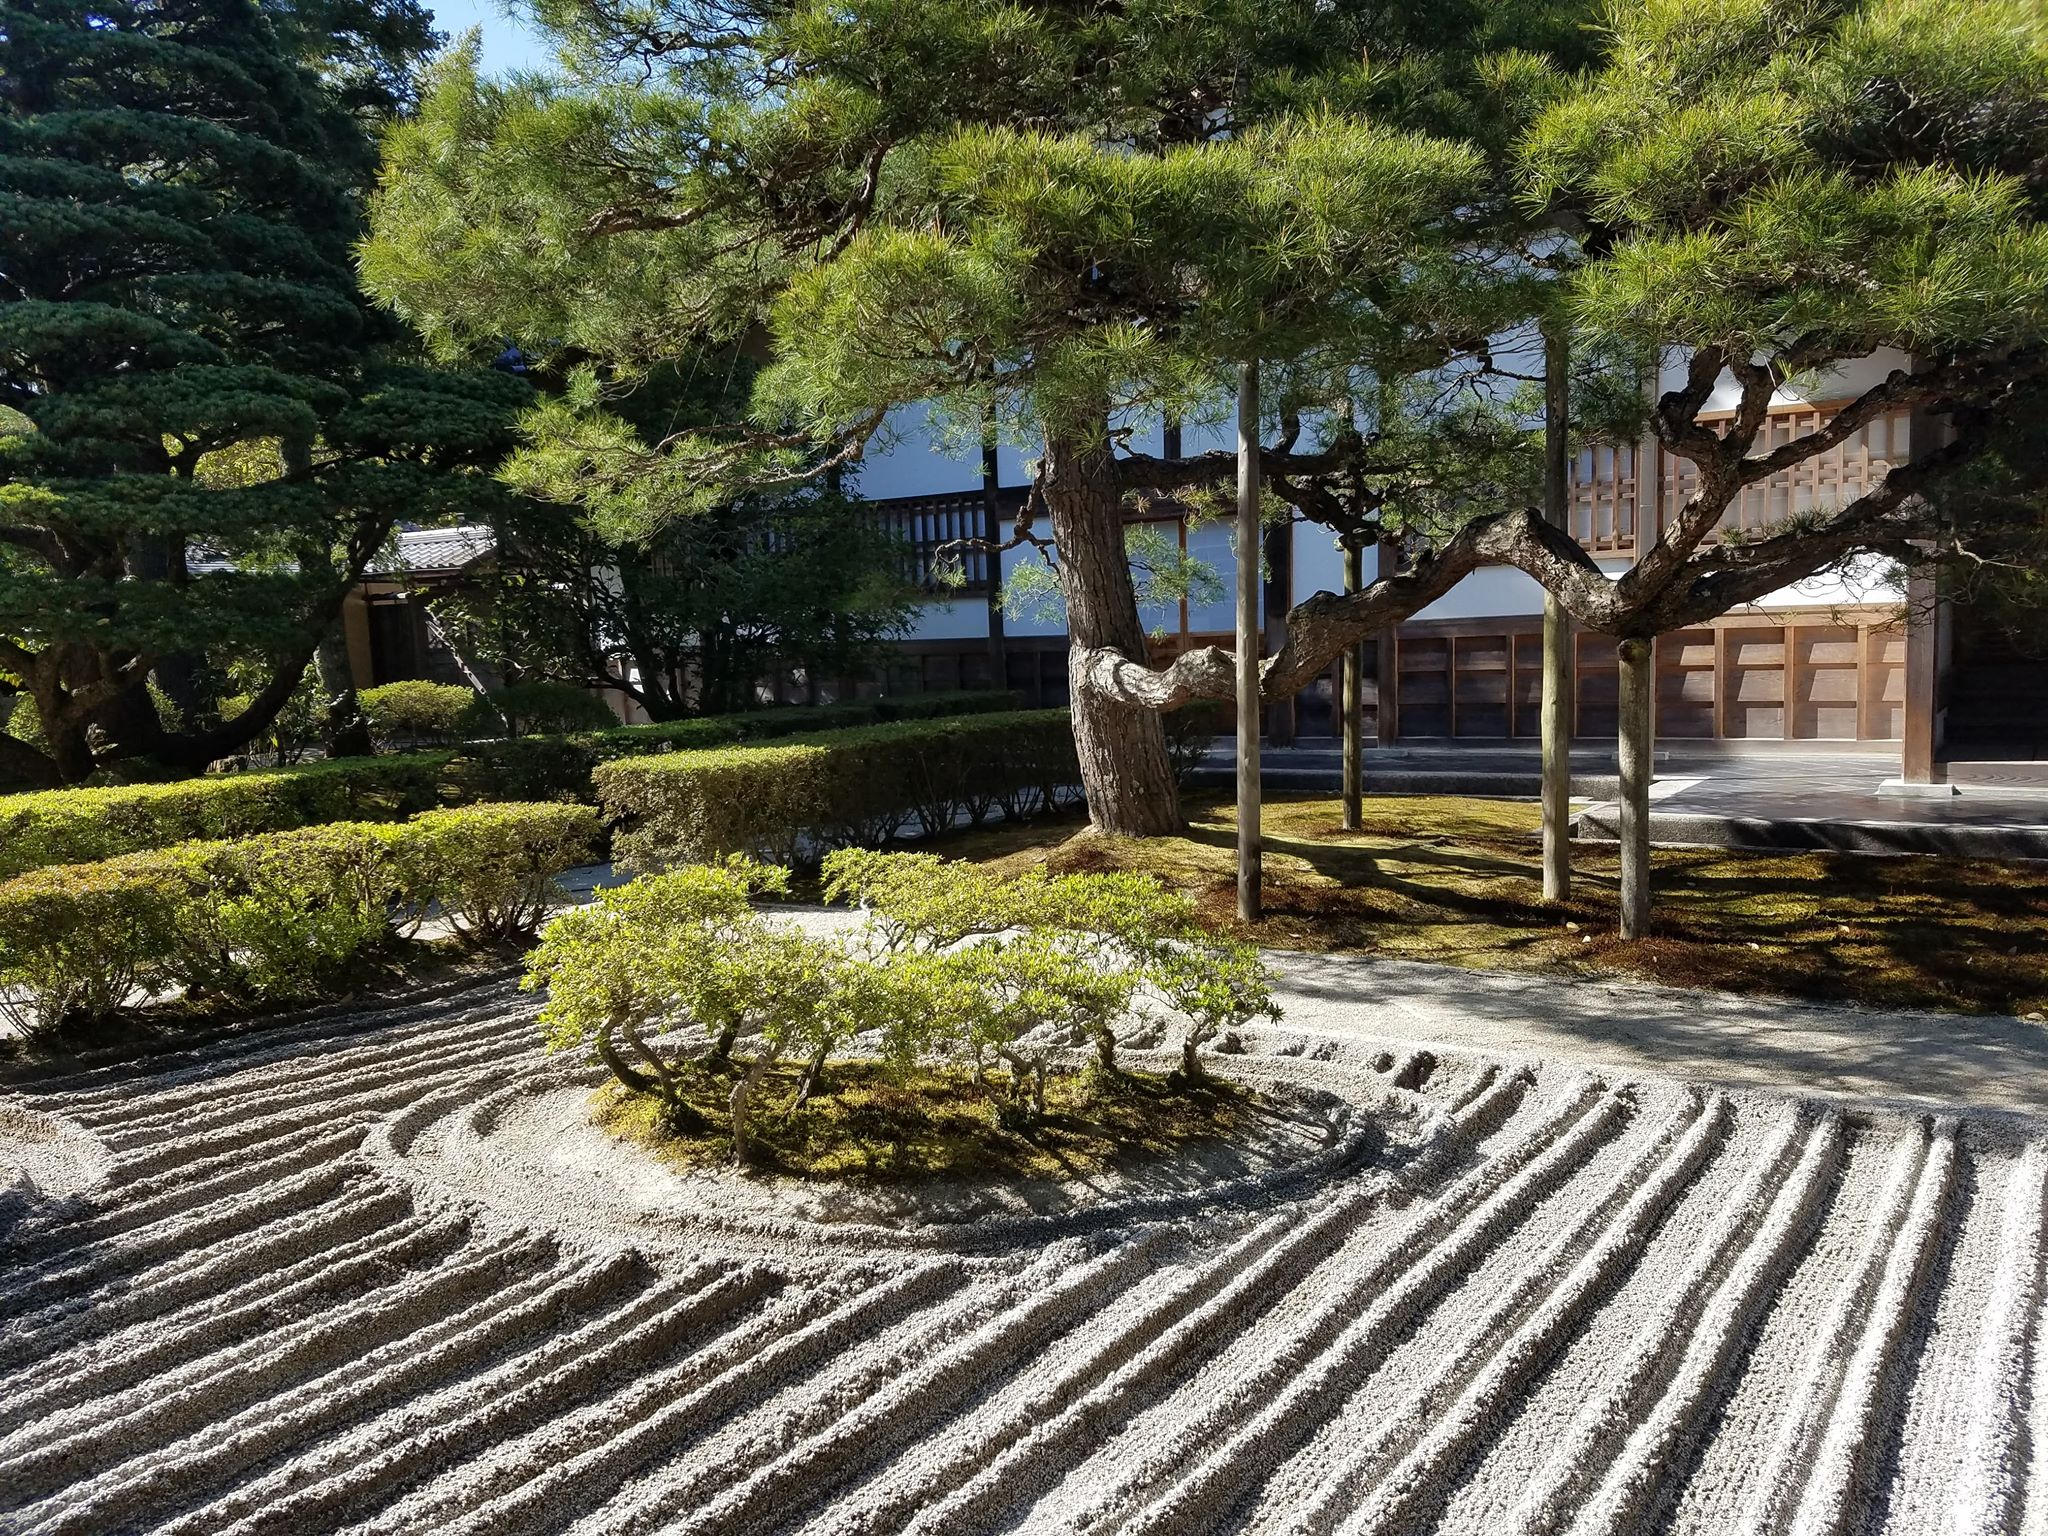 Sand and stone garden in Ginkaku-ji (Silver pavilion) temple, Kyoto